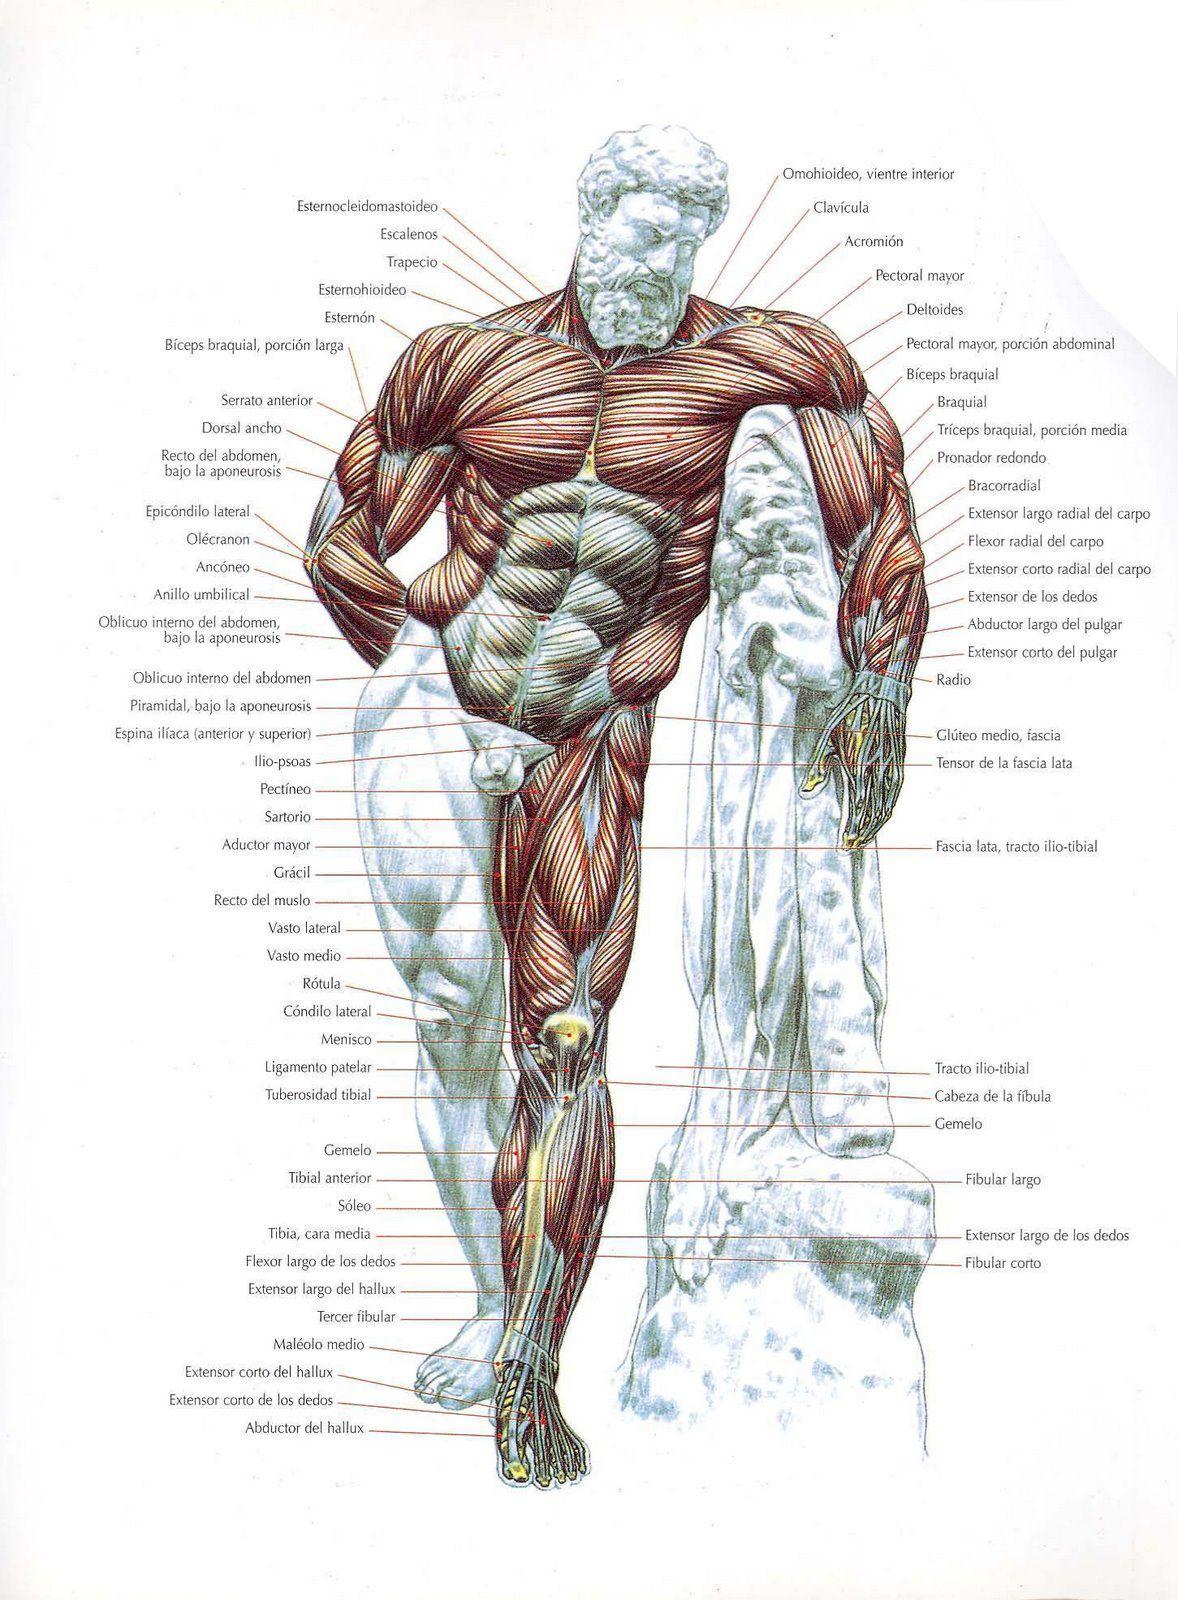 Anatomía muscular | Desenhos anatonicos | Pinterest | Anatomía ...